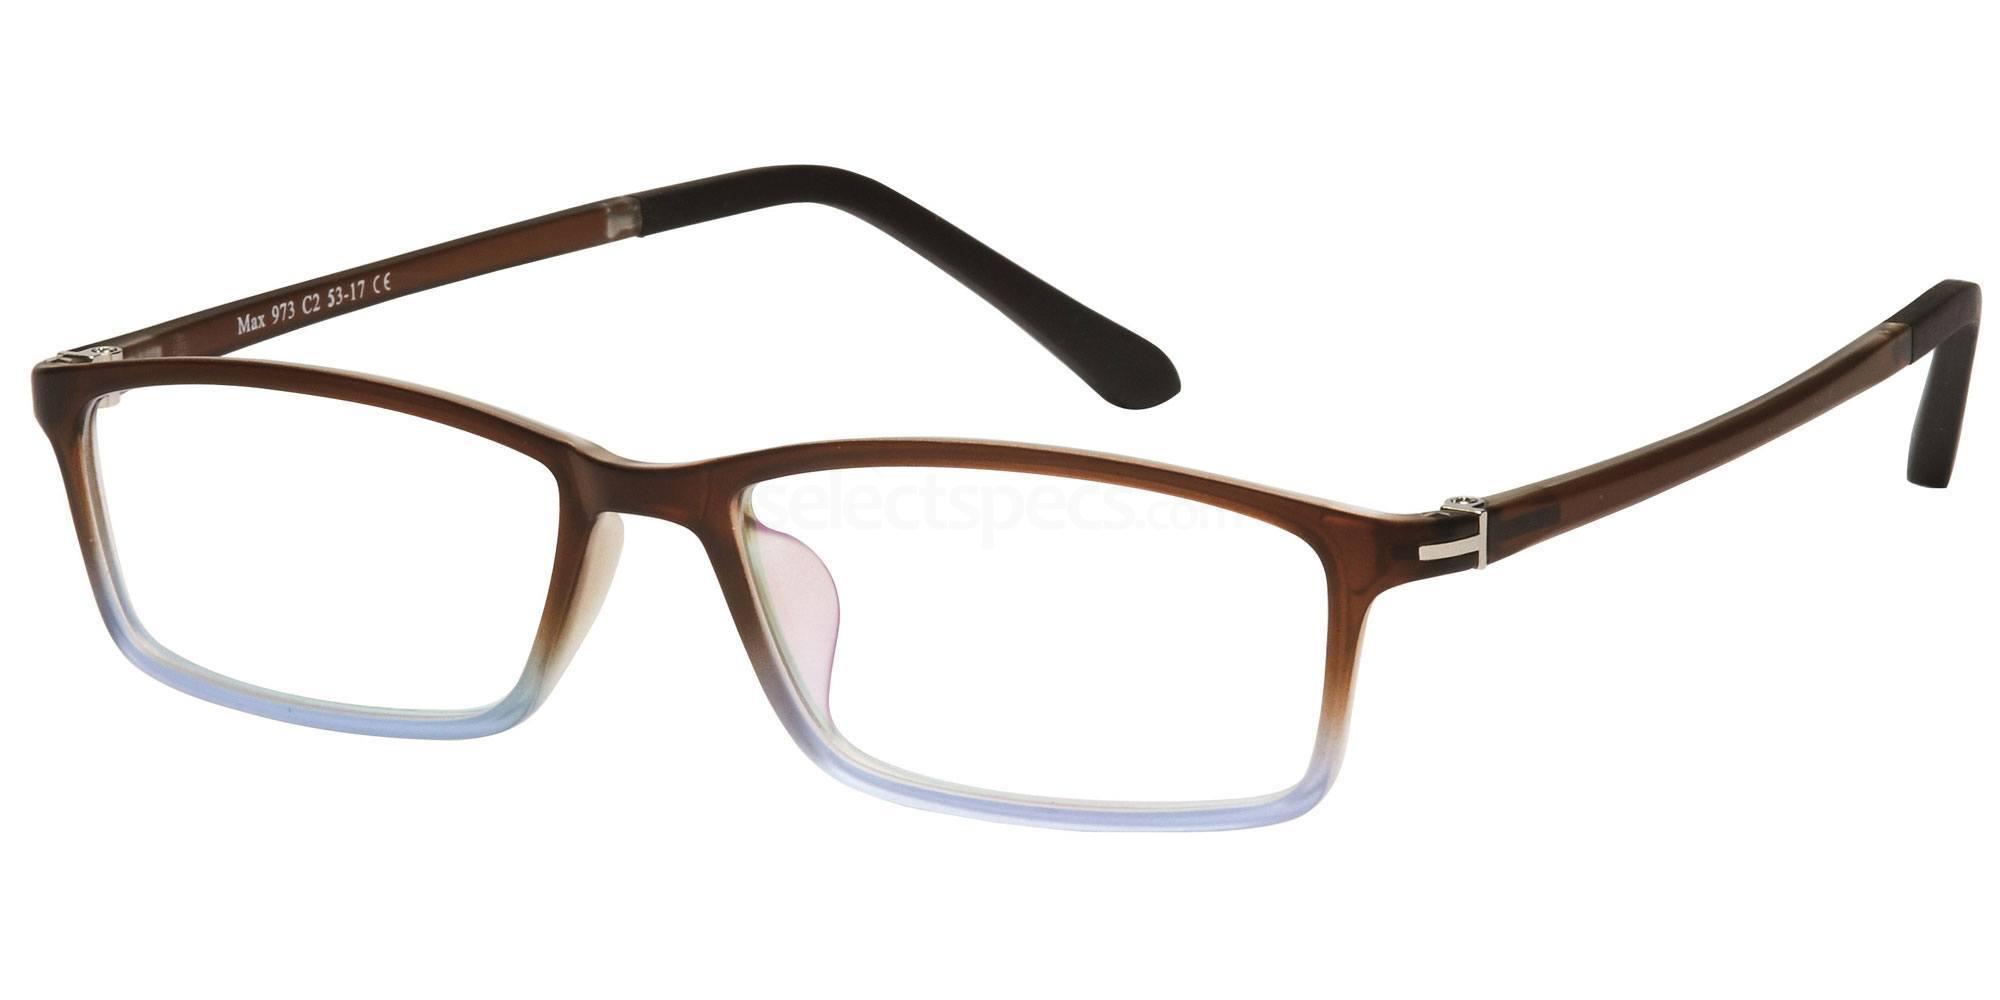 C2 M973 Glasses, Max Eyewear